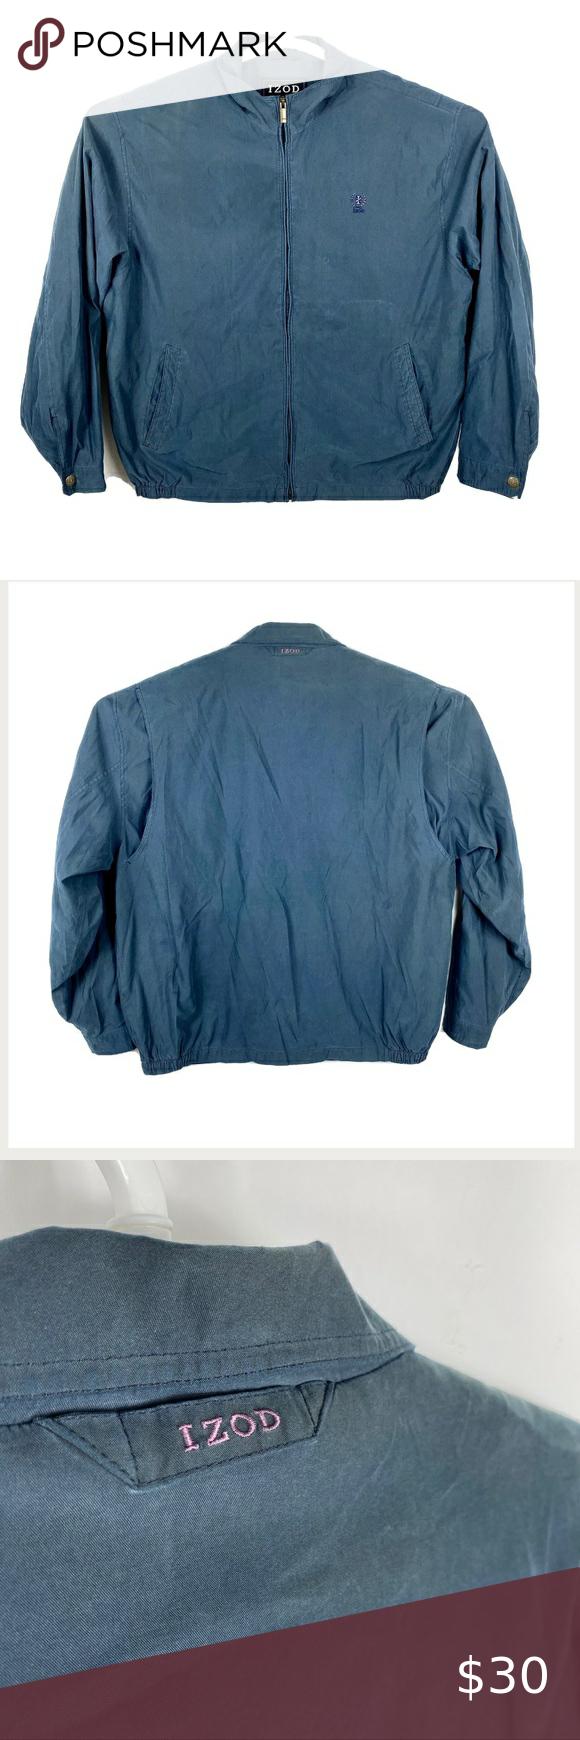 Izod Outerwear Mens Dad Jacket Size Xl Navy Blue Izod Outerwear Mens Dad Jacket Size Xl Navy Blue Vent Zip Up Light Coat 2577 Slight Br Outerwear Jackets Izod [ 1740 x 580 Pixel ]